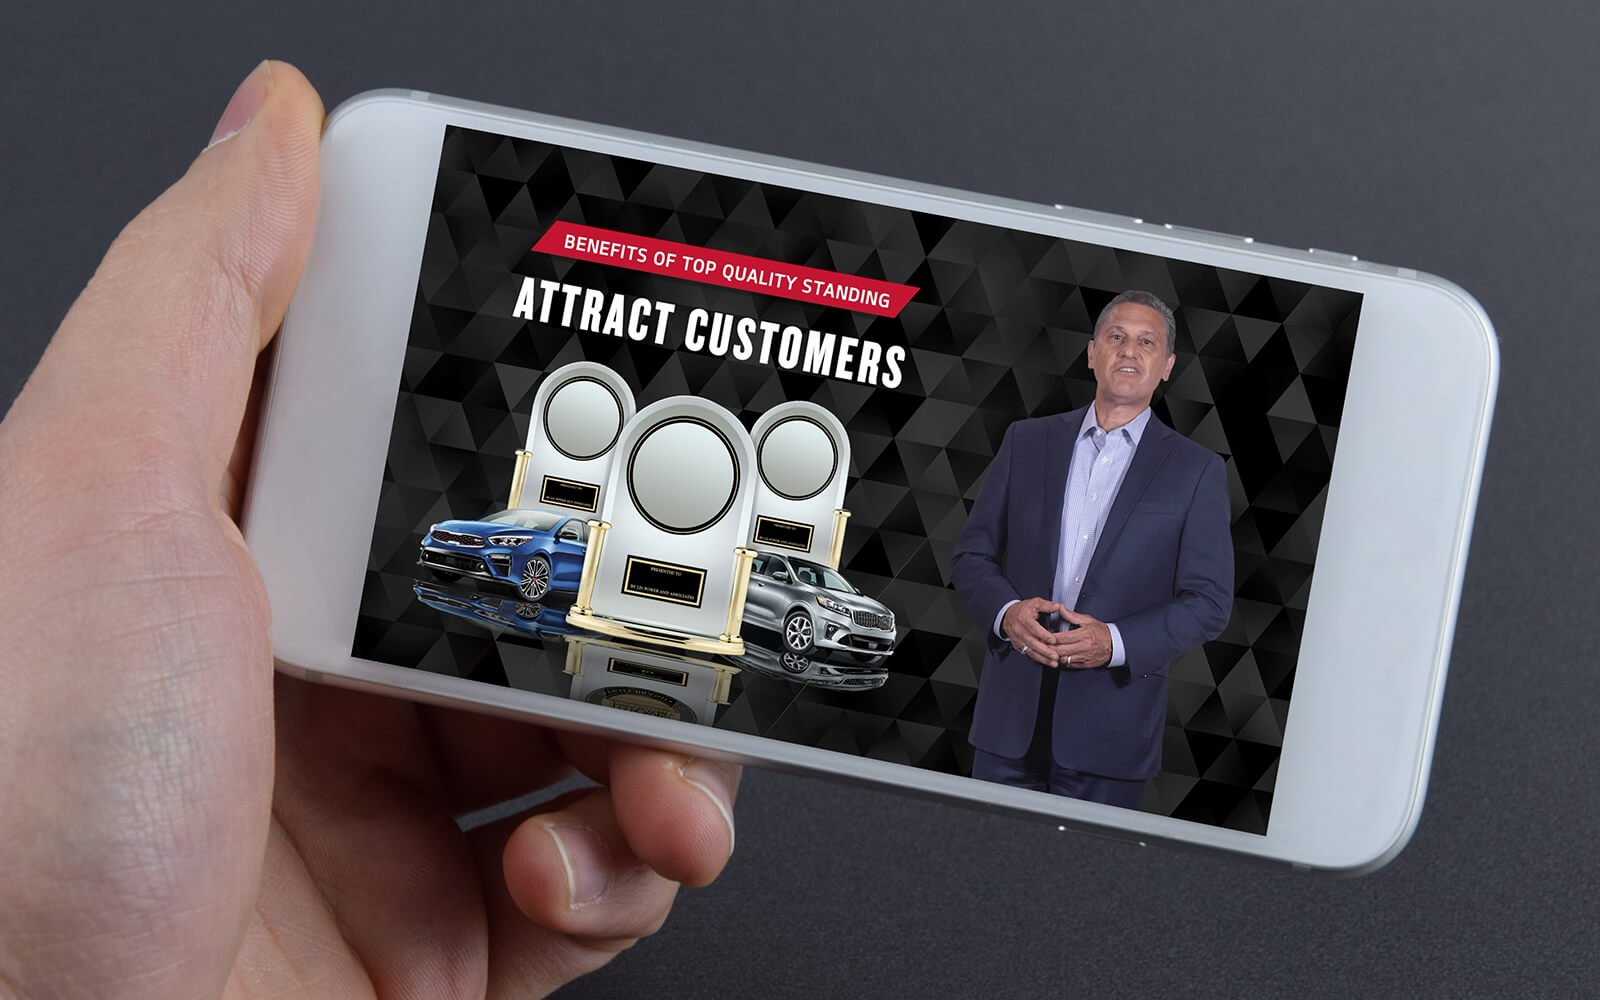 Executive address video introducing quality goals